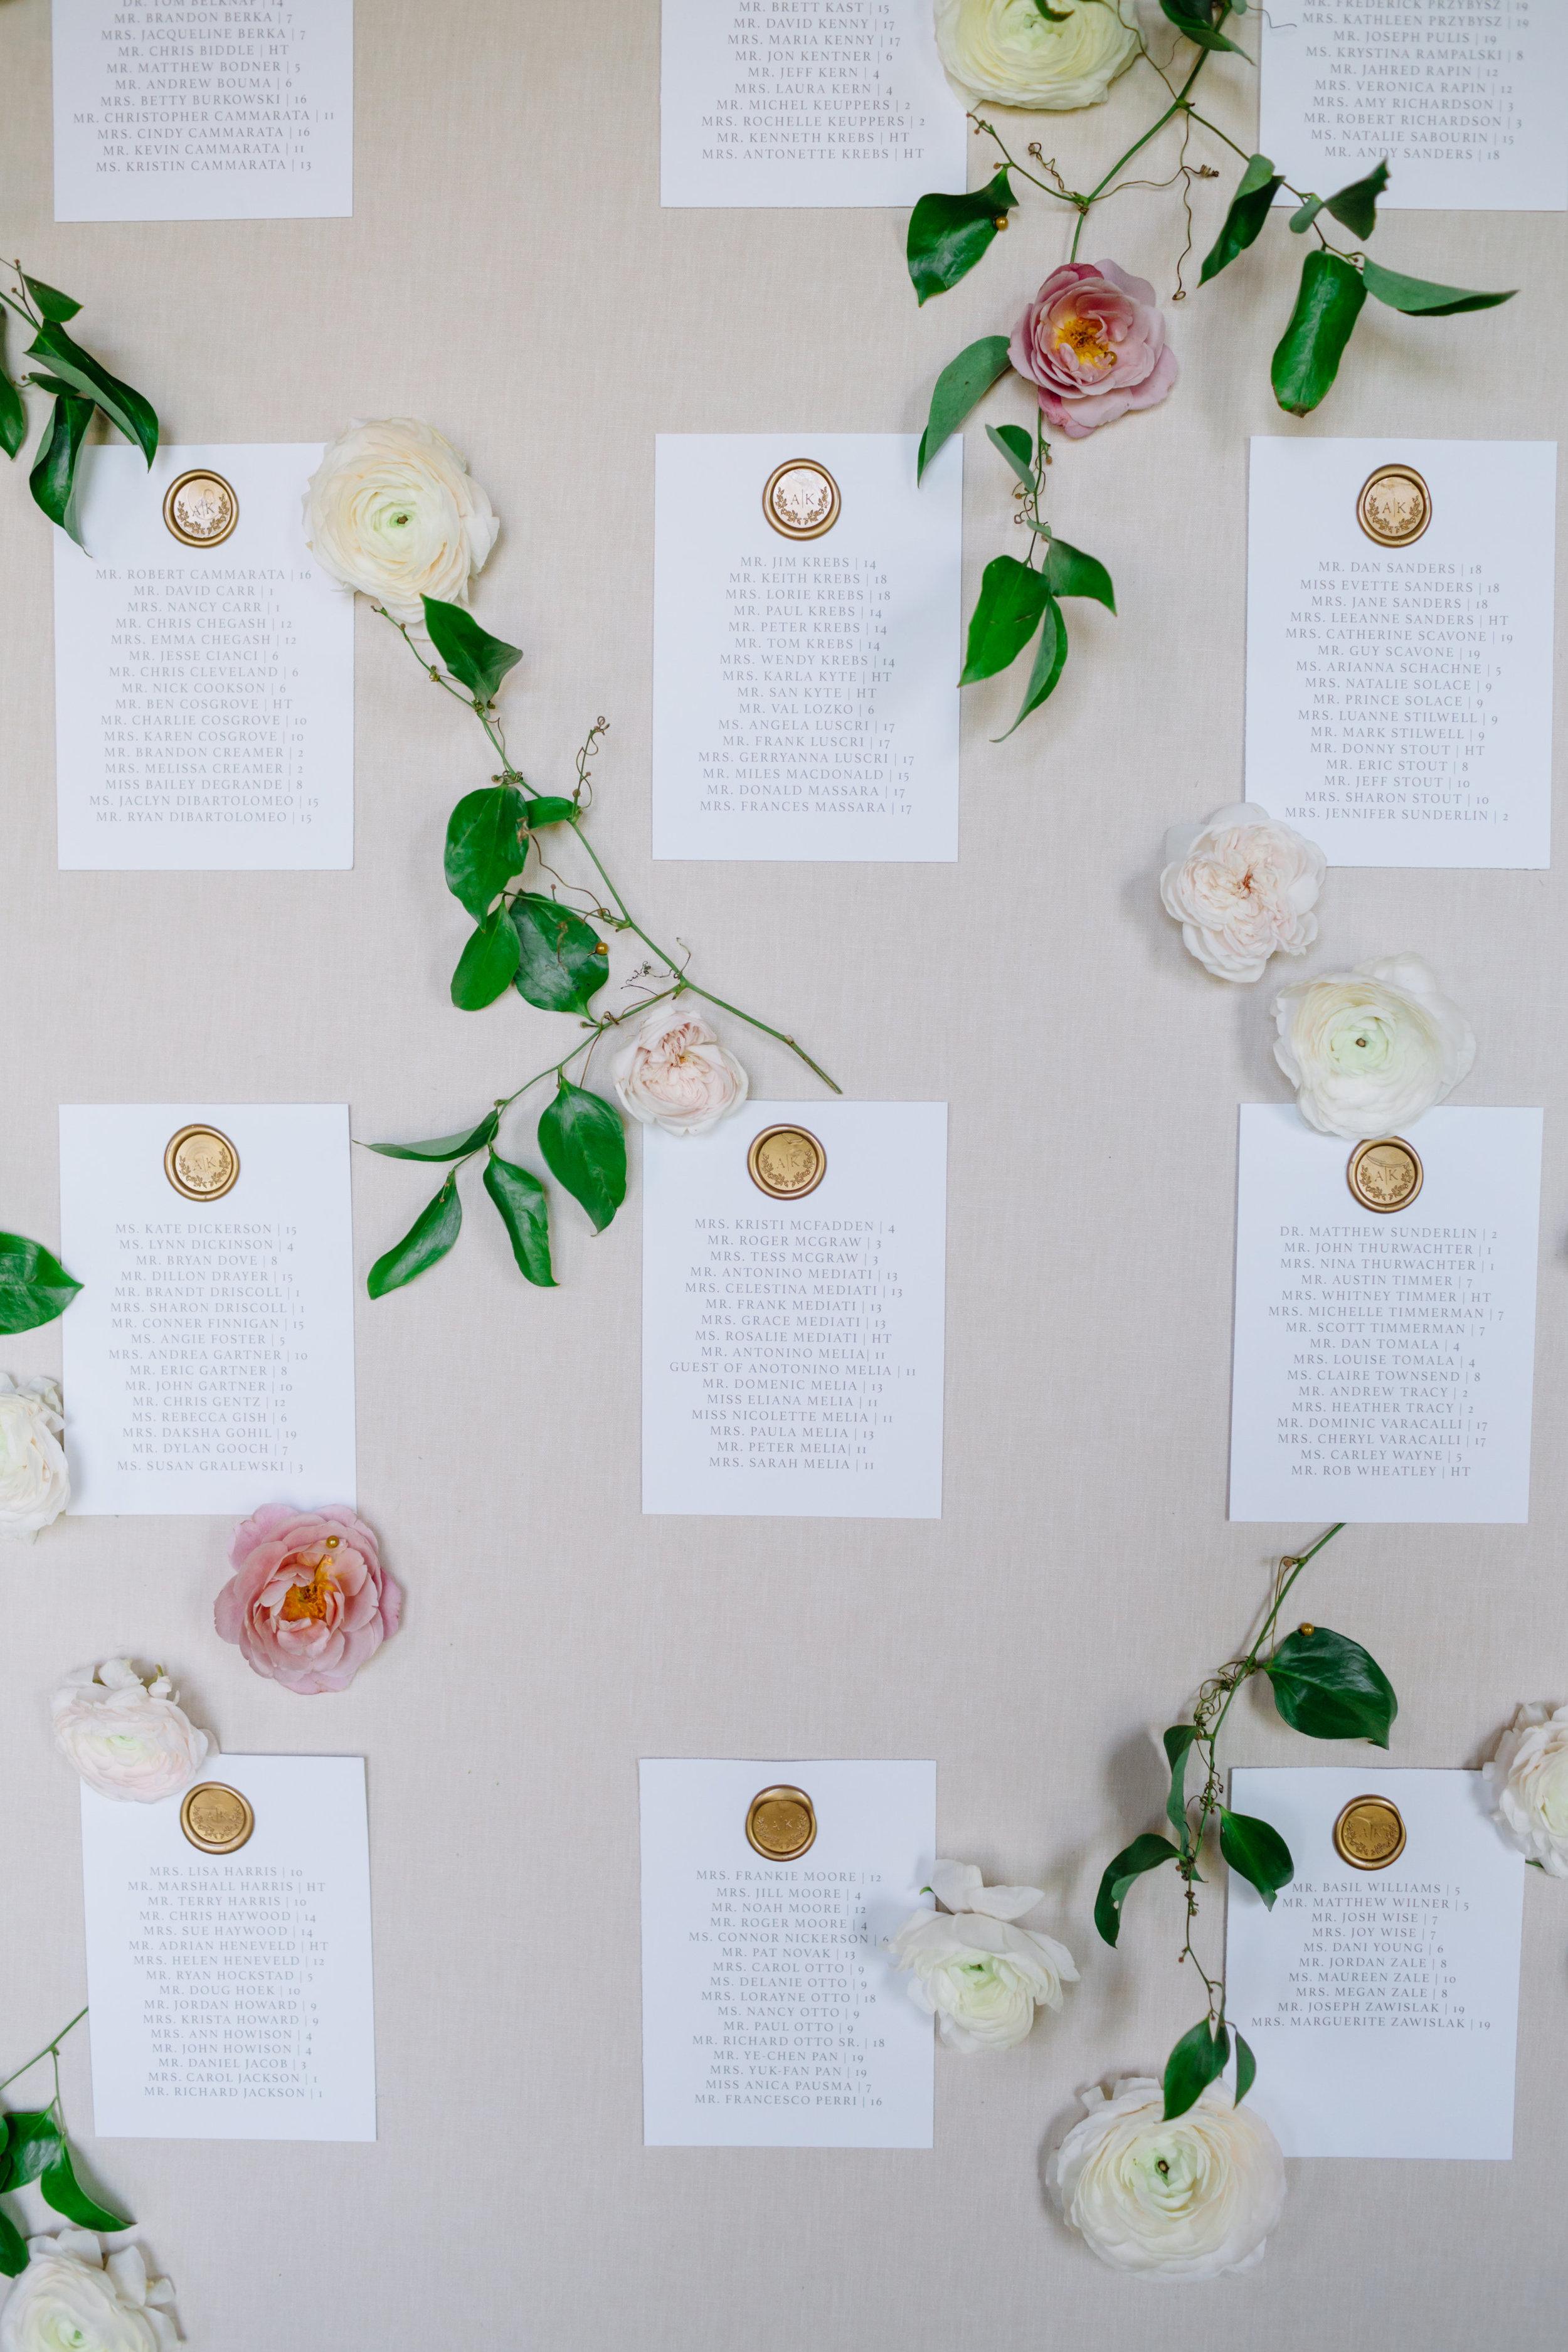 custom wedding planners michigan event design paper goods florals escort card wall